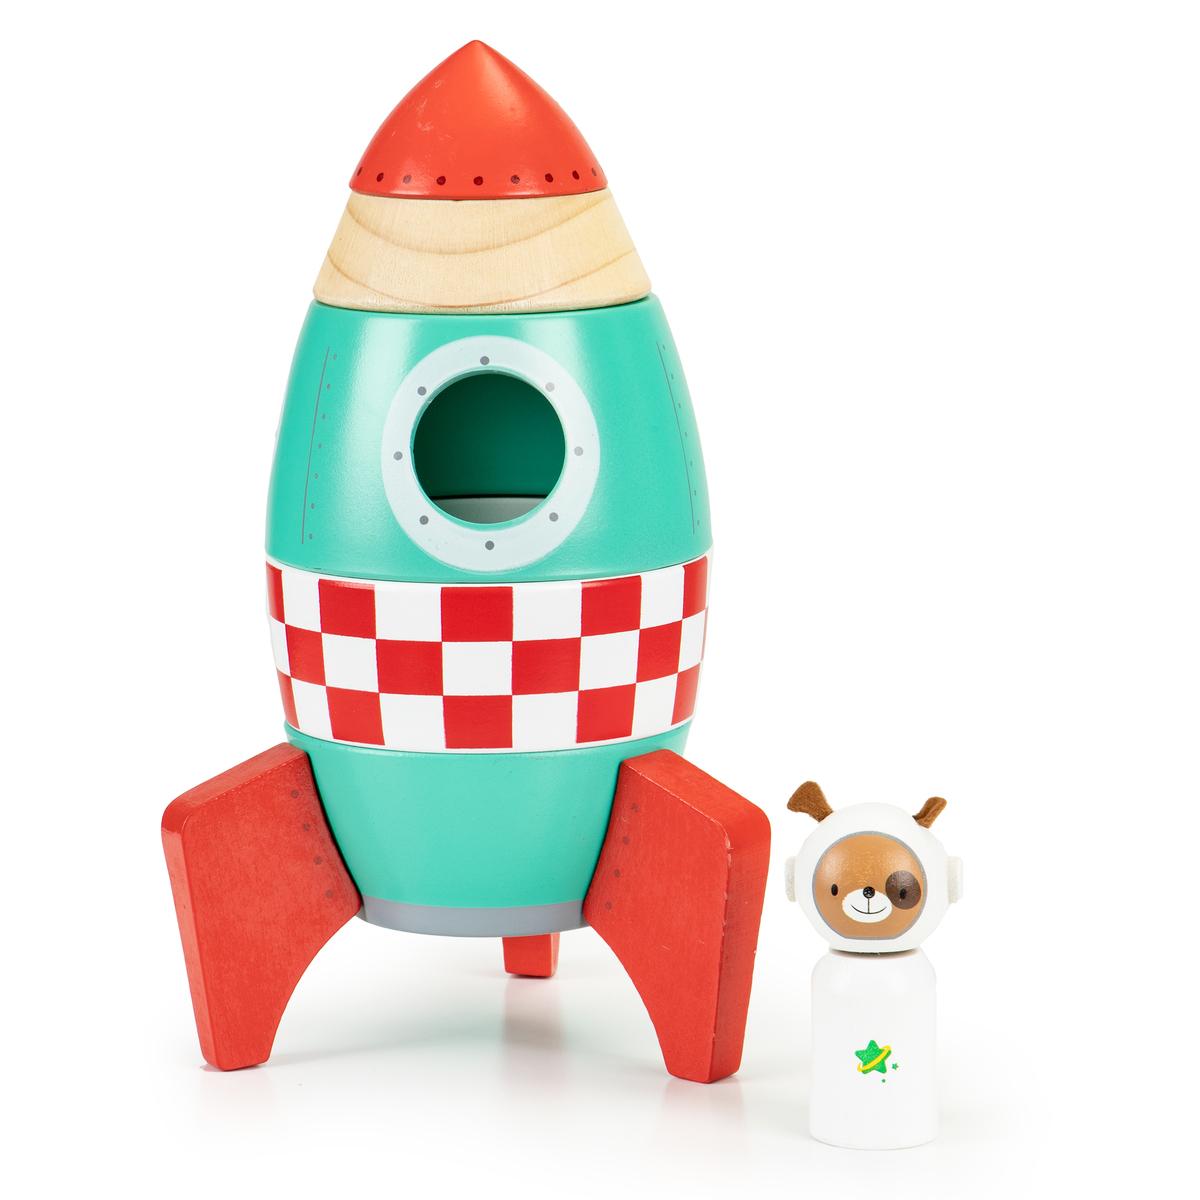 Drevená skladacia raketa EcoToys Kids wooden racket